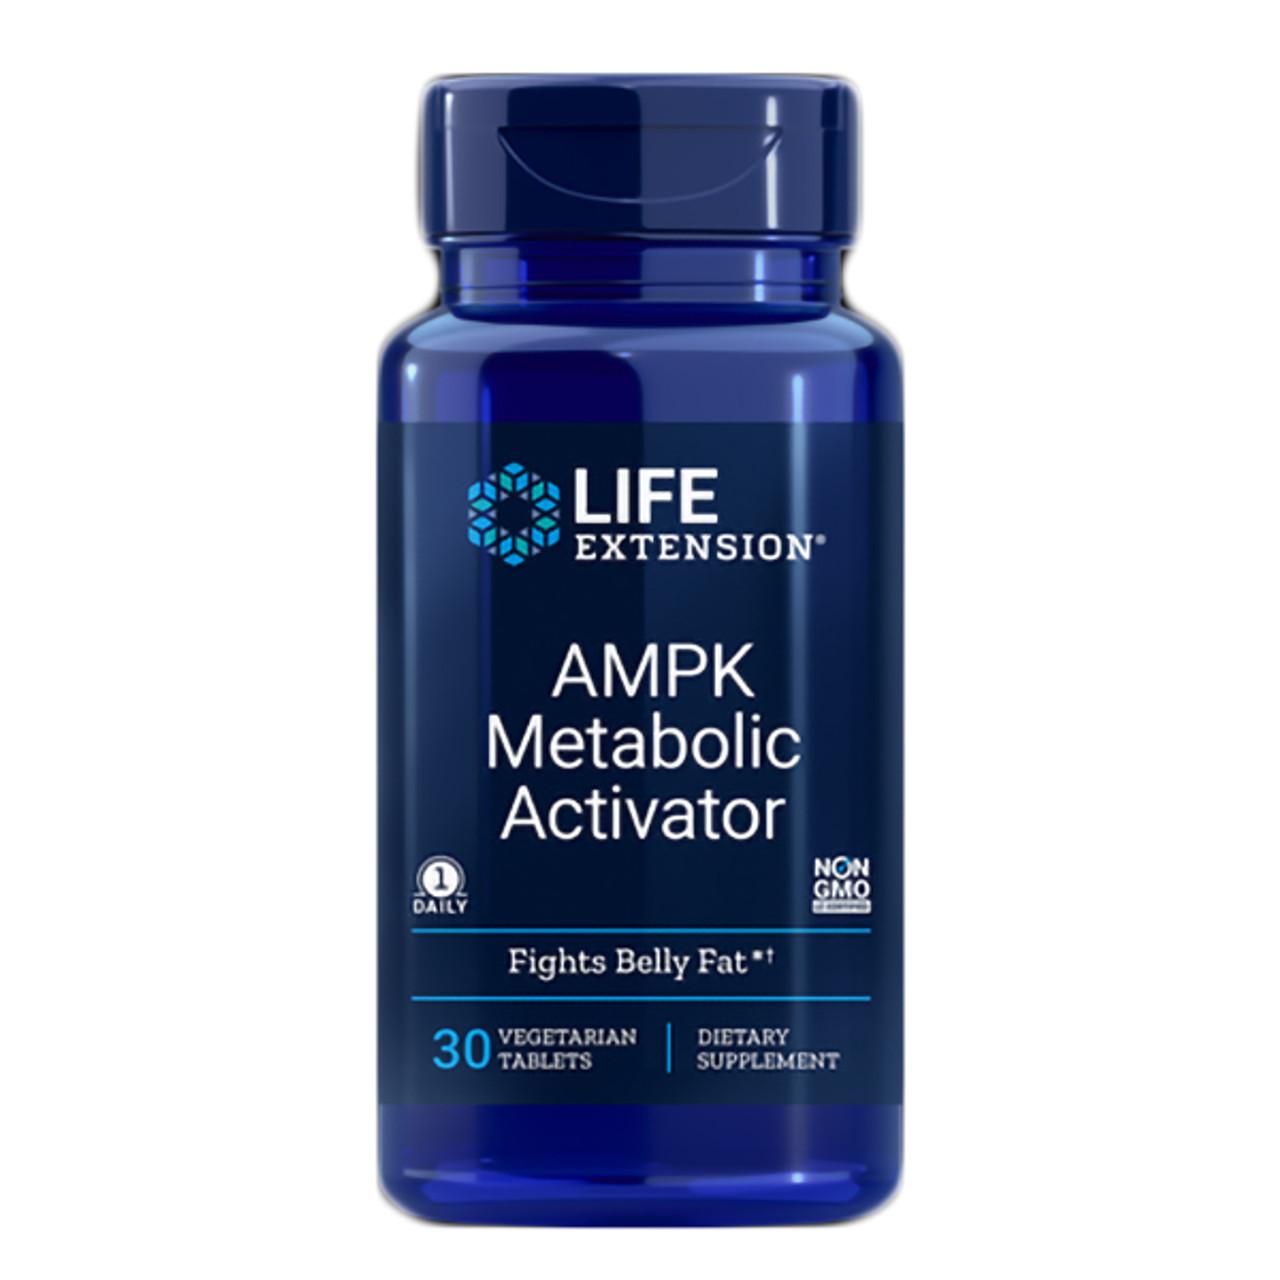 AMPK Metabolic Activator 30 Veg Tabs